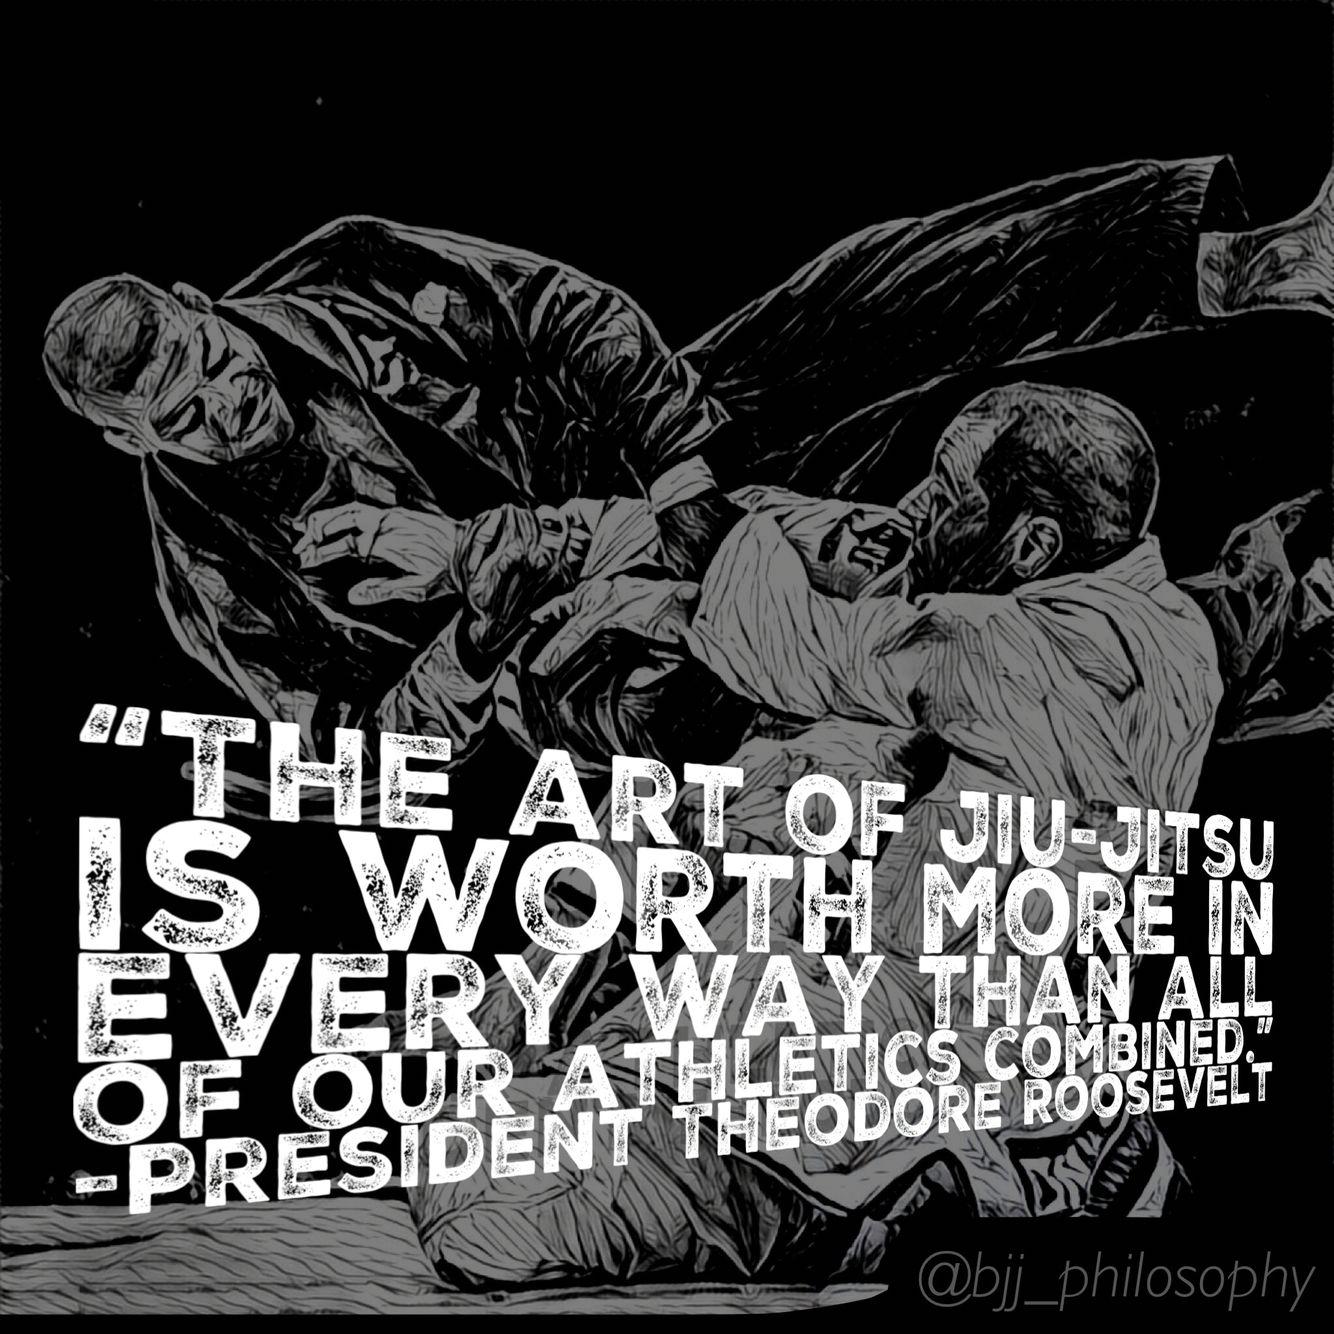 Instagram Bjj Philosophy Jiujitsu Mma Quote Bjj Jiu Jitsu Jiu Jitsu Quotes Bjj